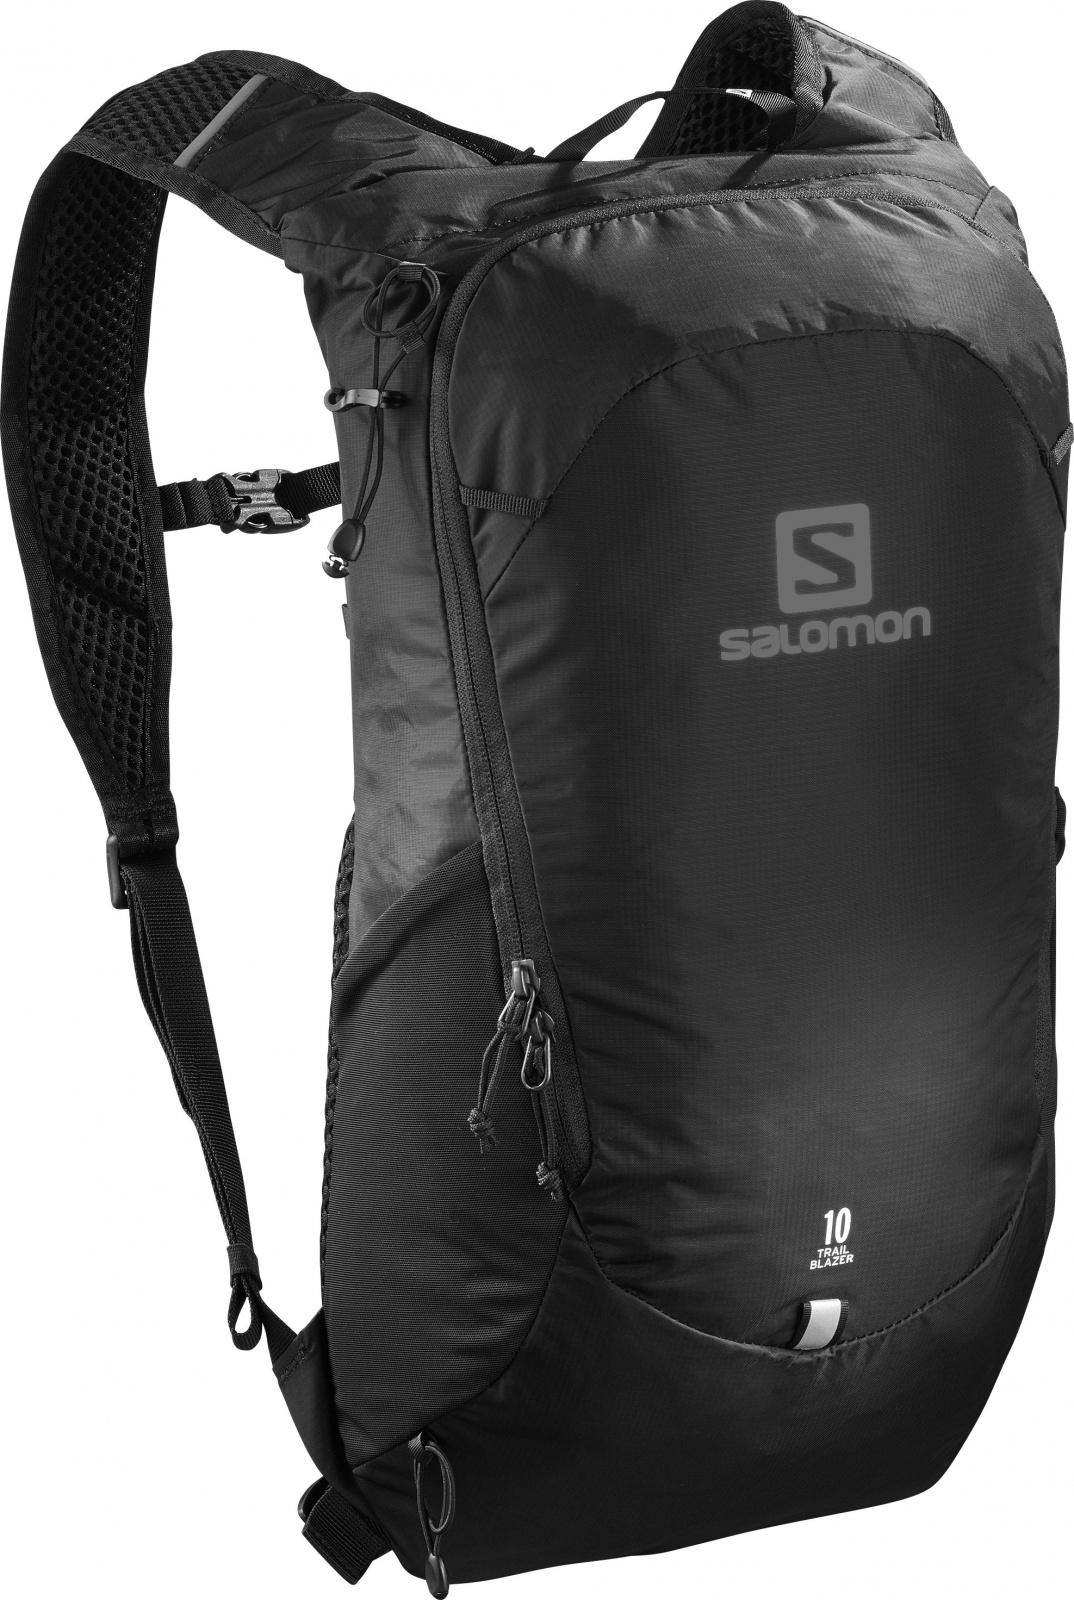 Levně Salomon Trailblazer 10 black/black Batoh Turistika